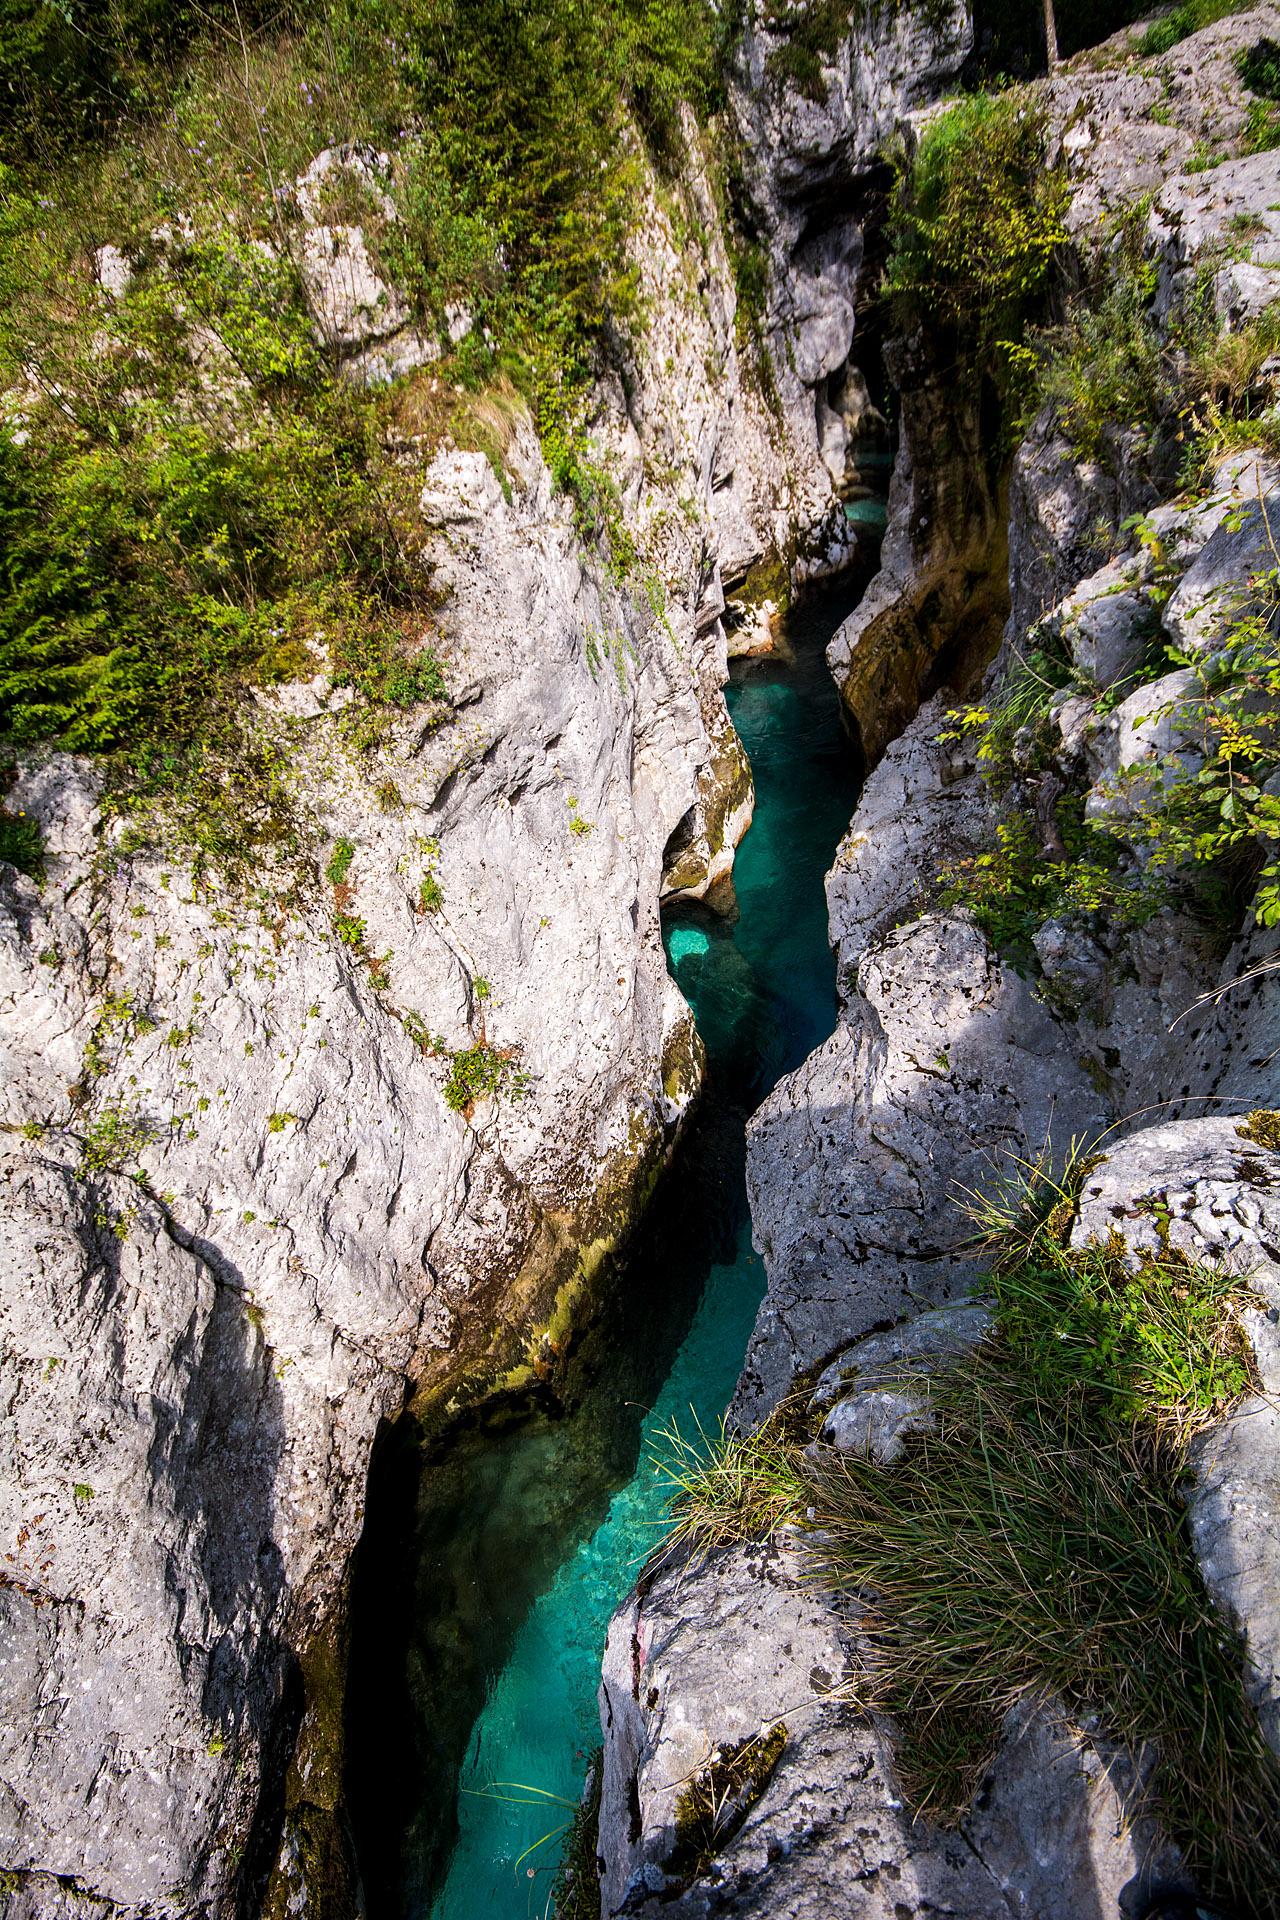 Soca River Gorge